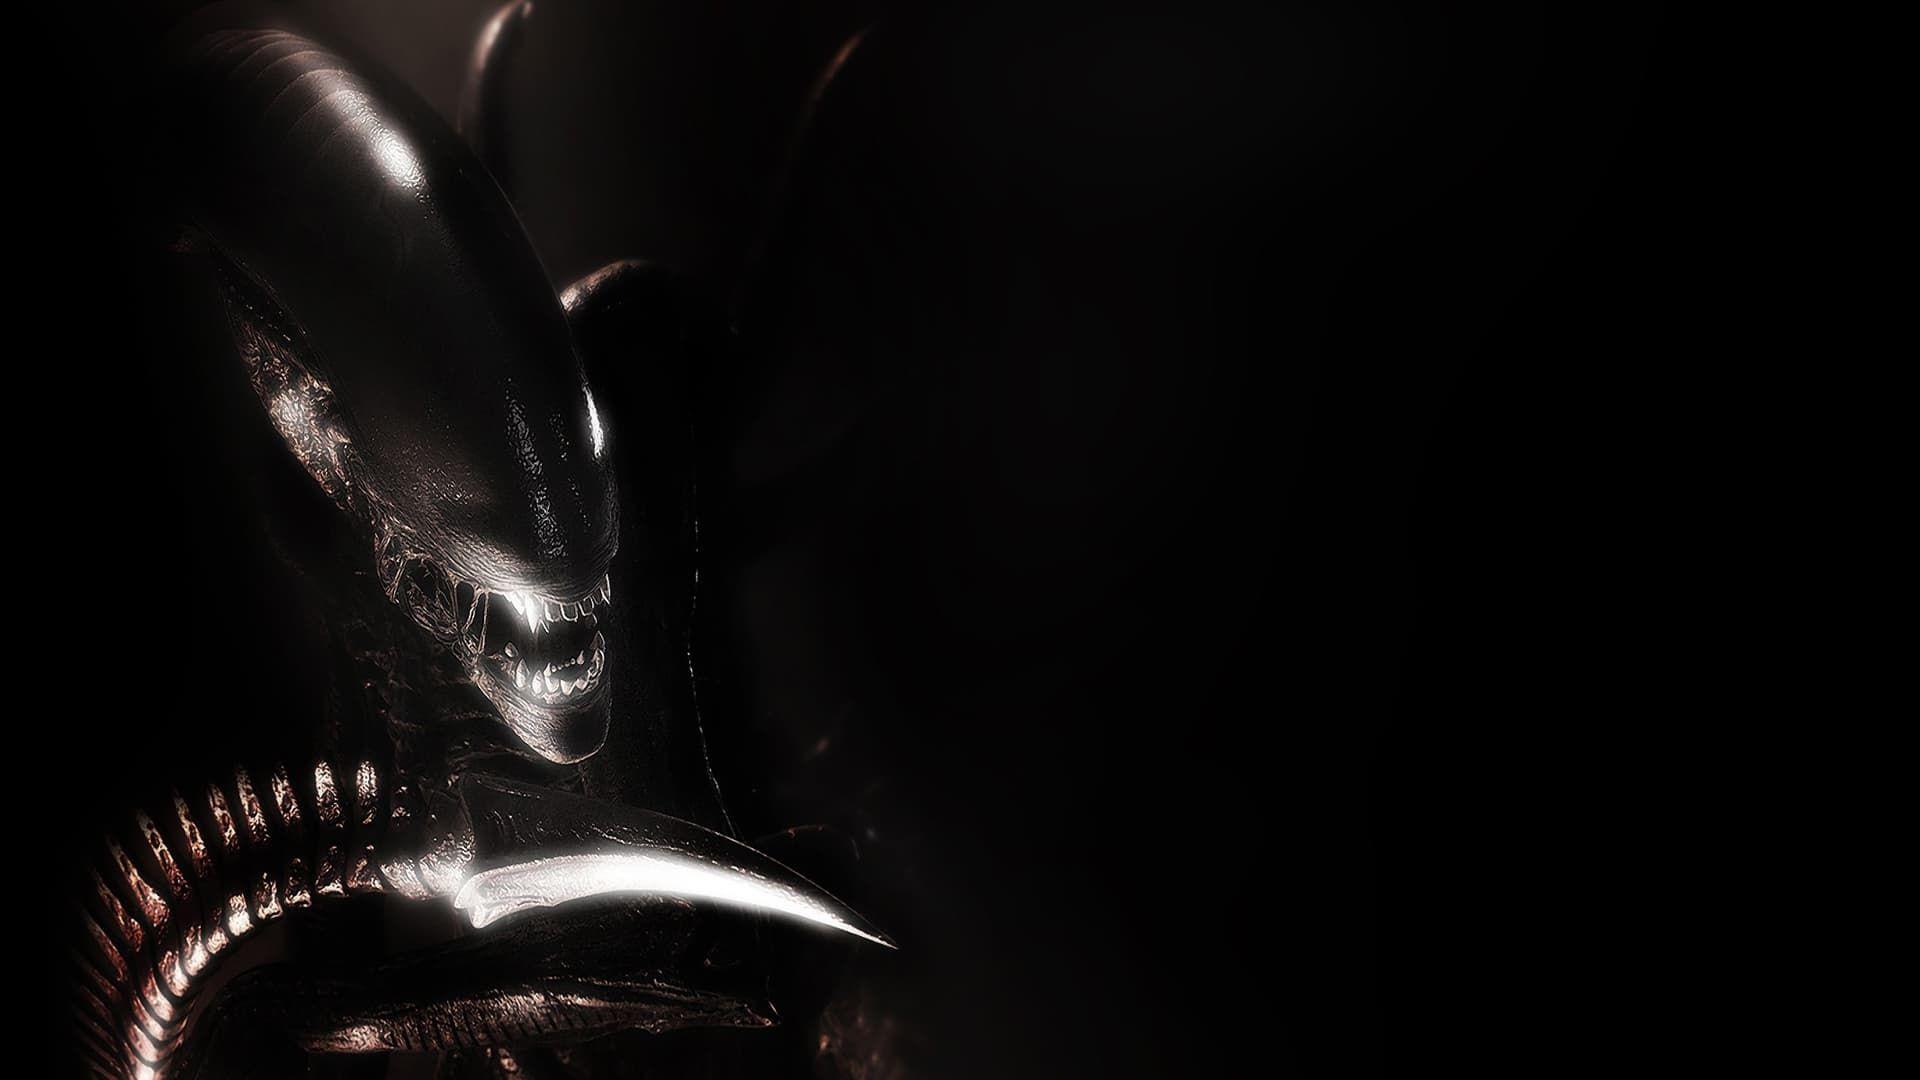 Download Wallpaper Alien For Mobile